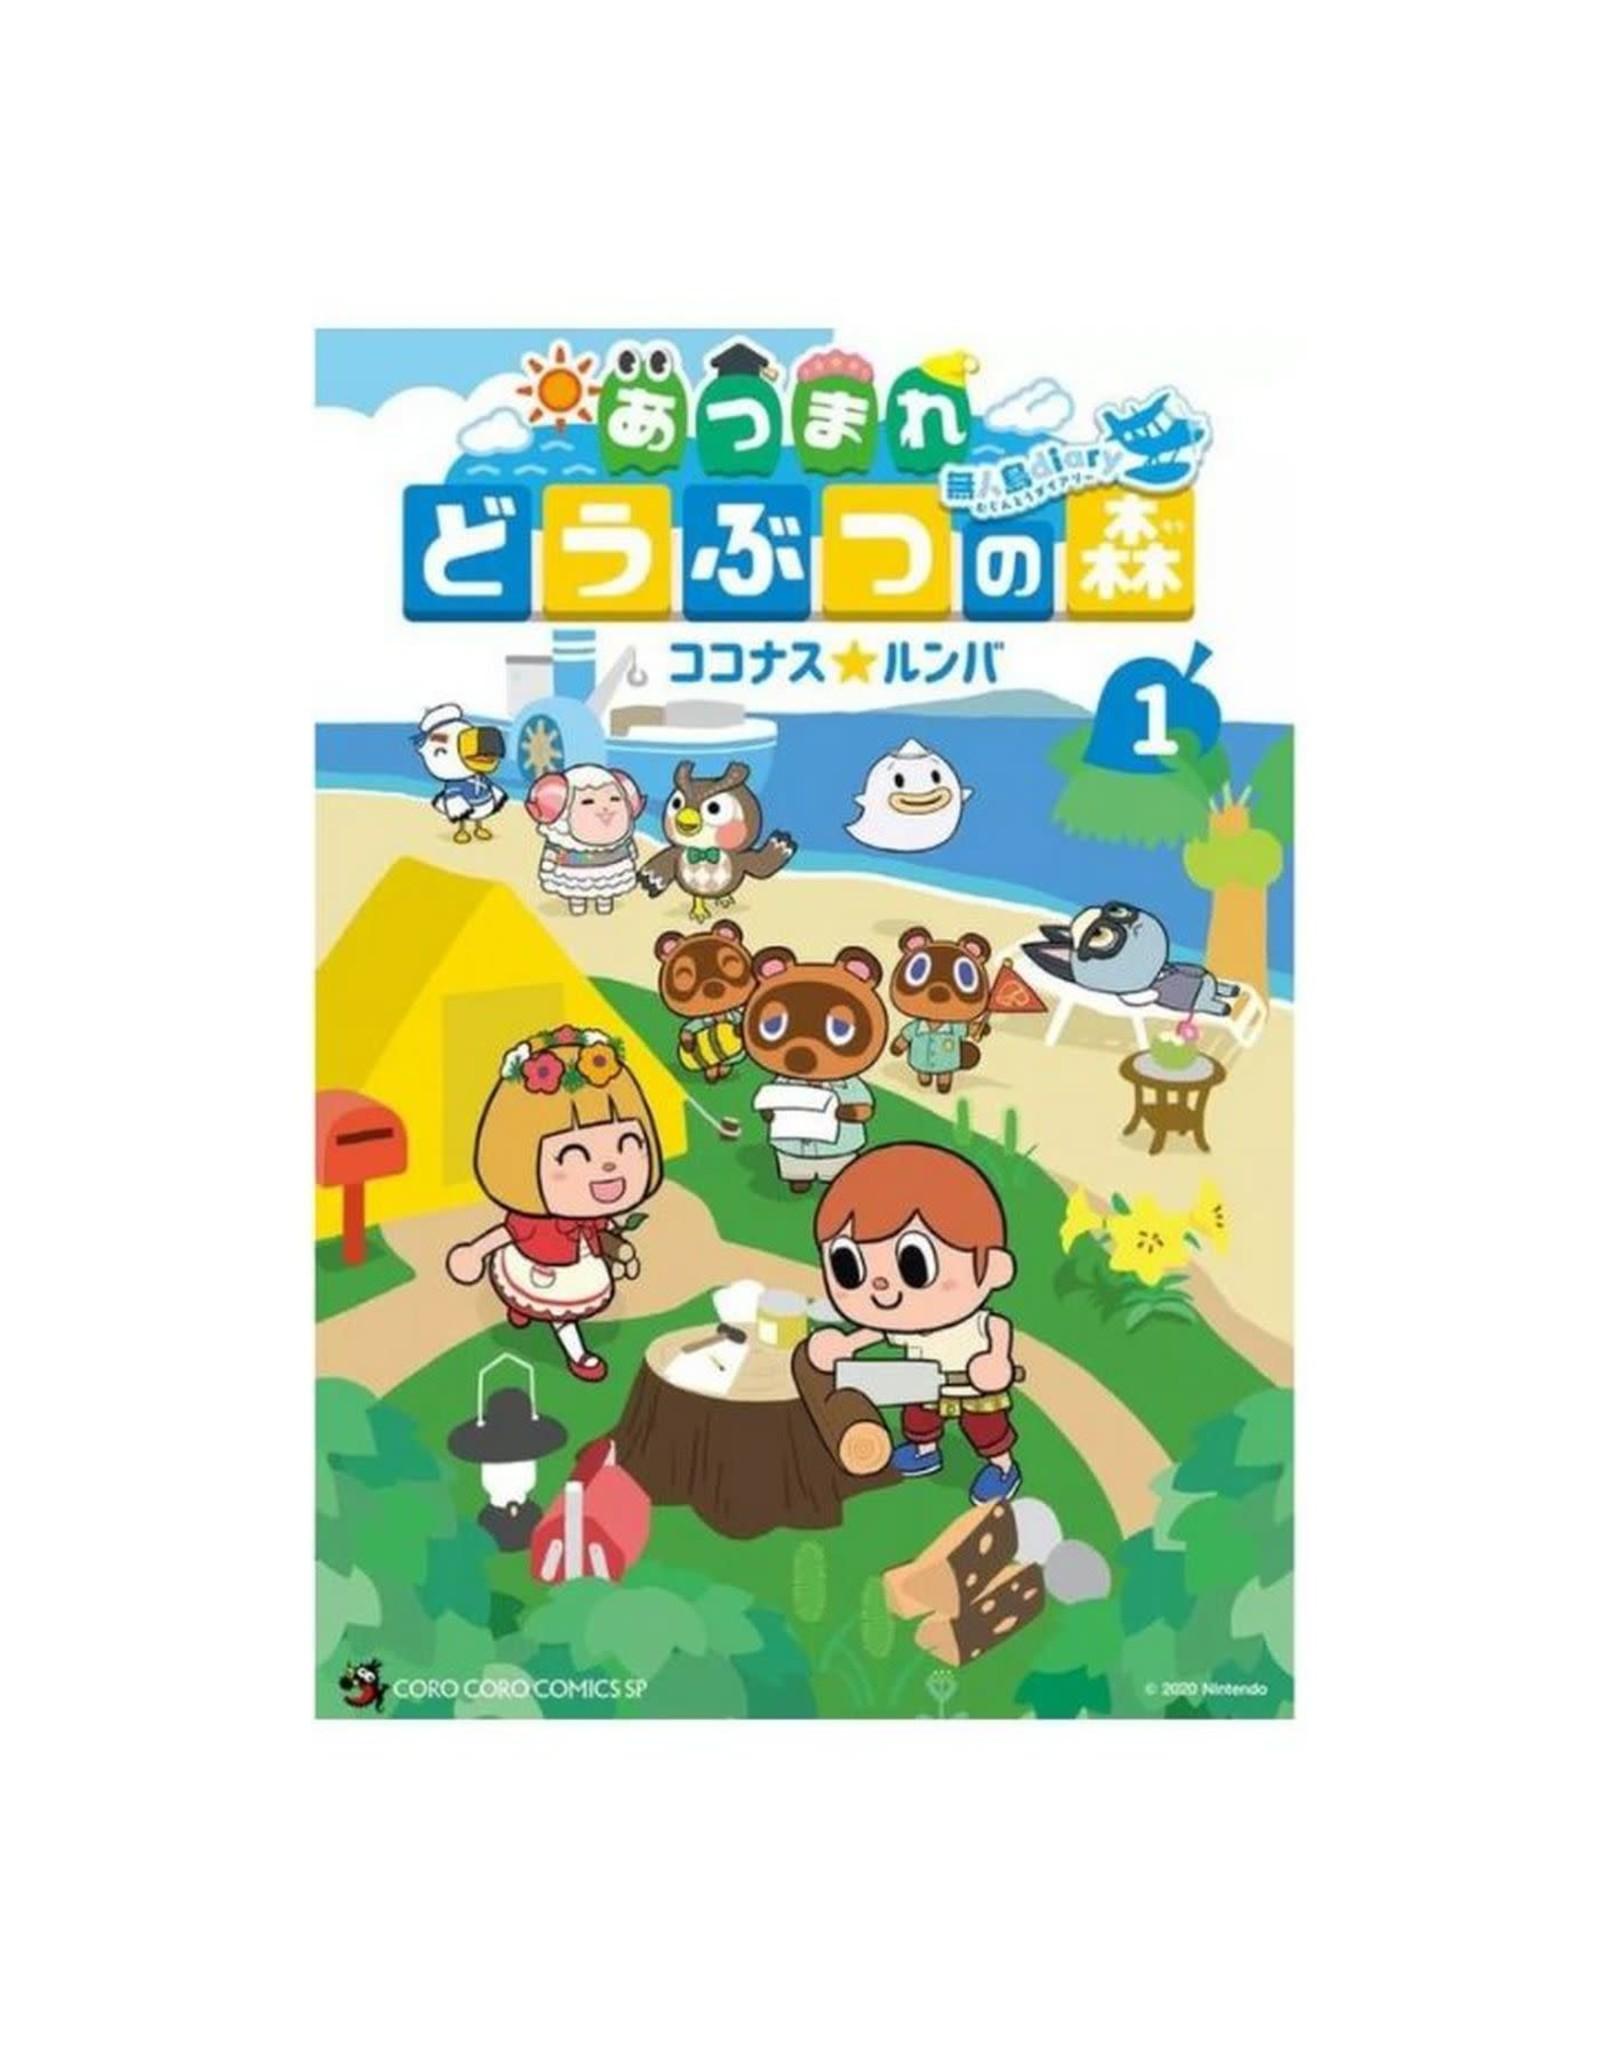 Animal Crossing: New Horizons: Deserted Island Diary 1 (Engelstalig) - Manga